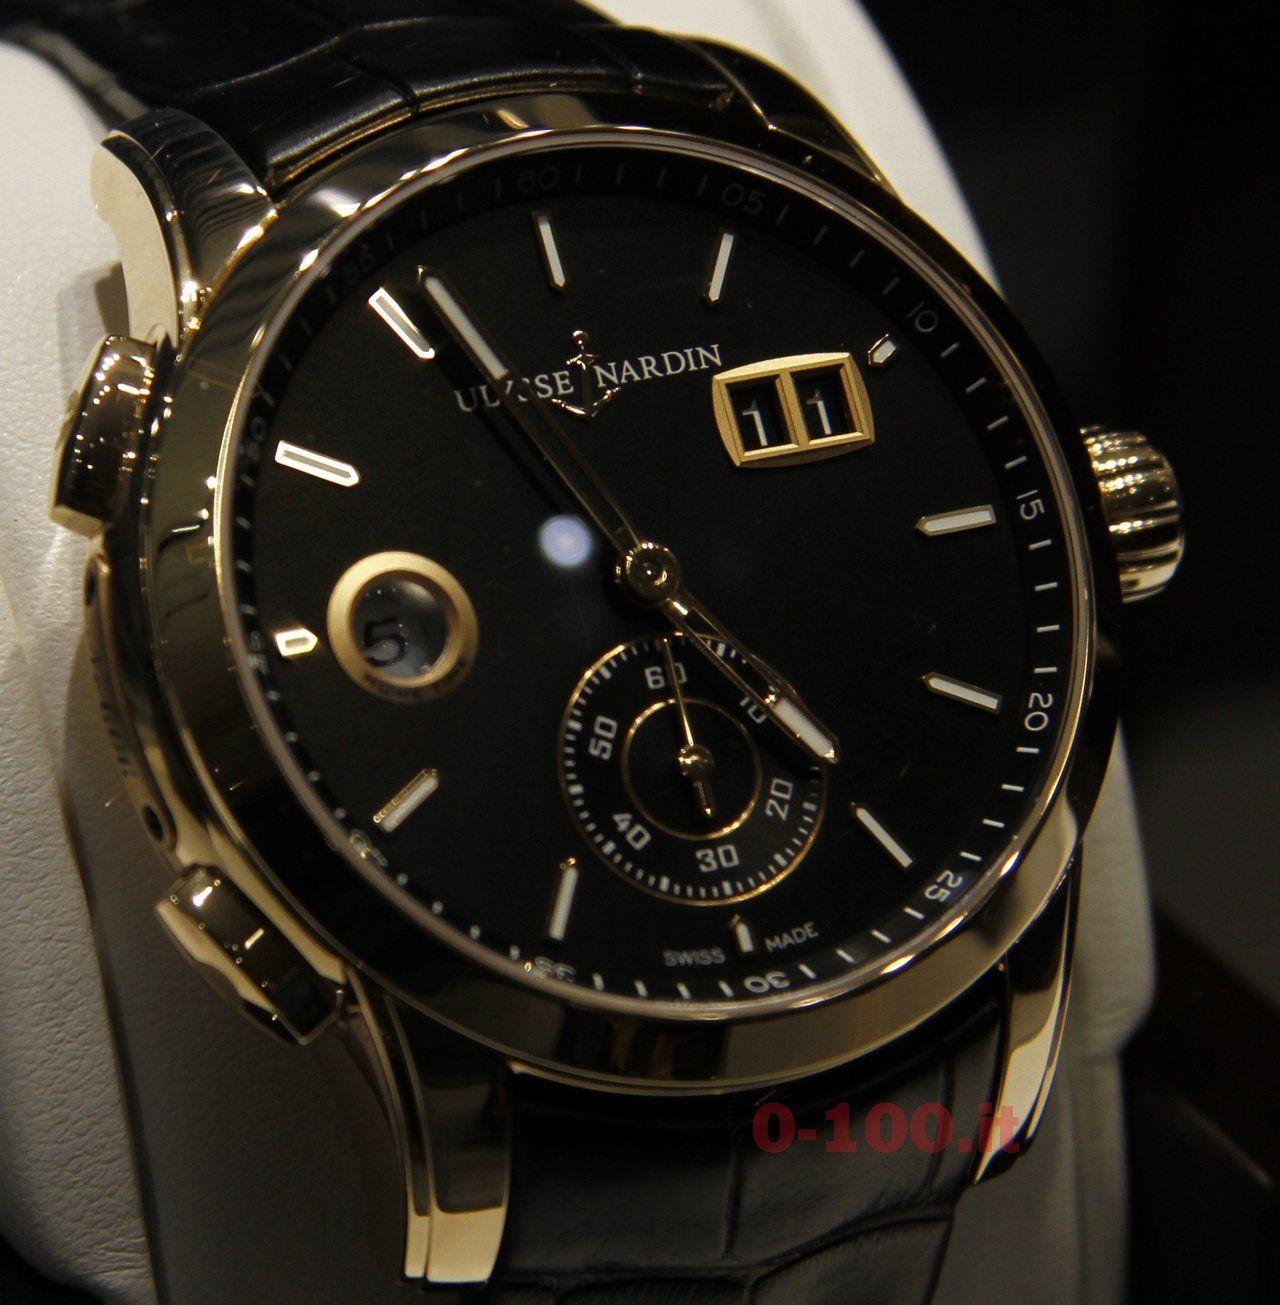 baselworld-2014-Ulysse Nardin Dual Time Manufacture_Ref_3346-126-91_0-1009